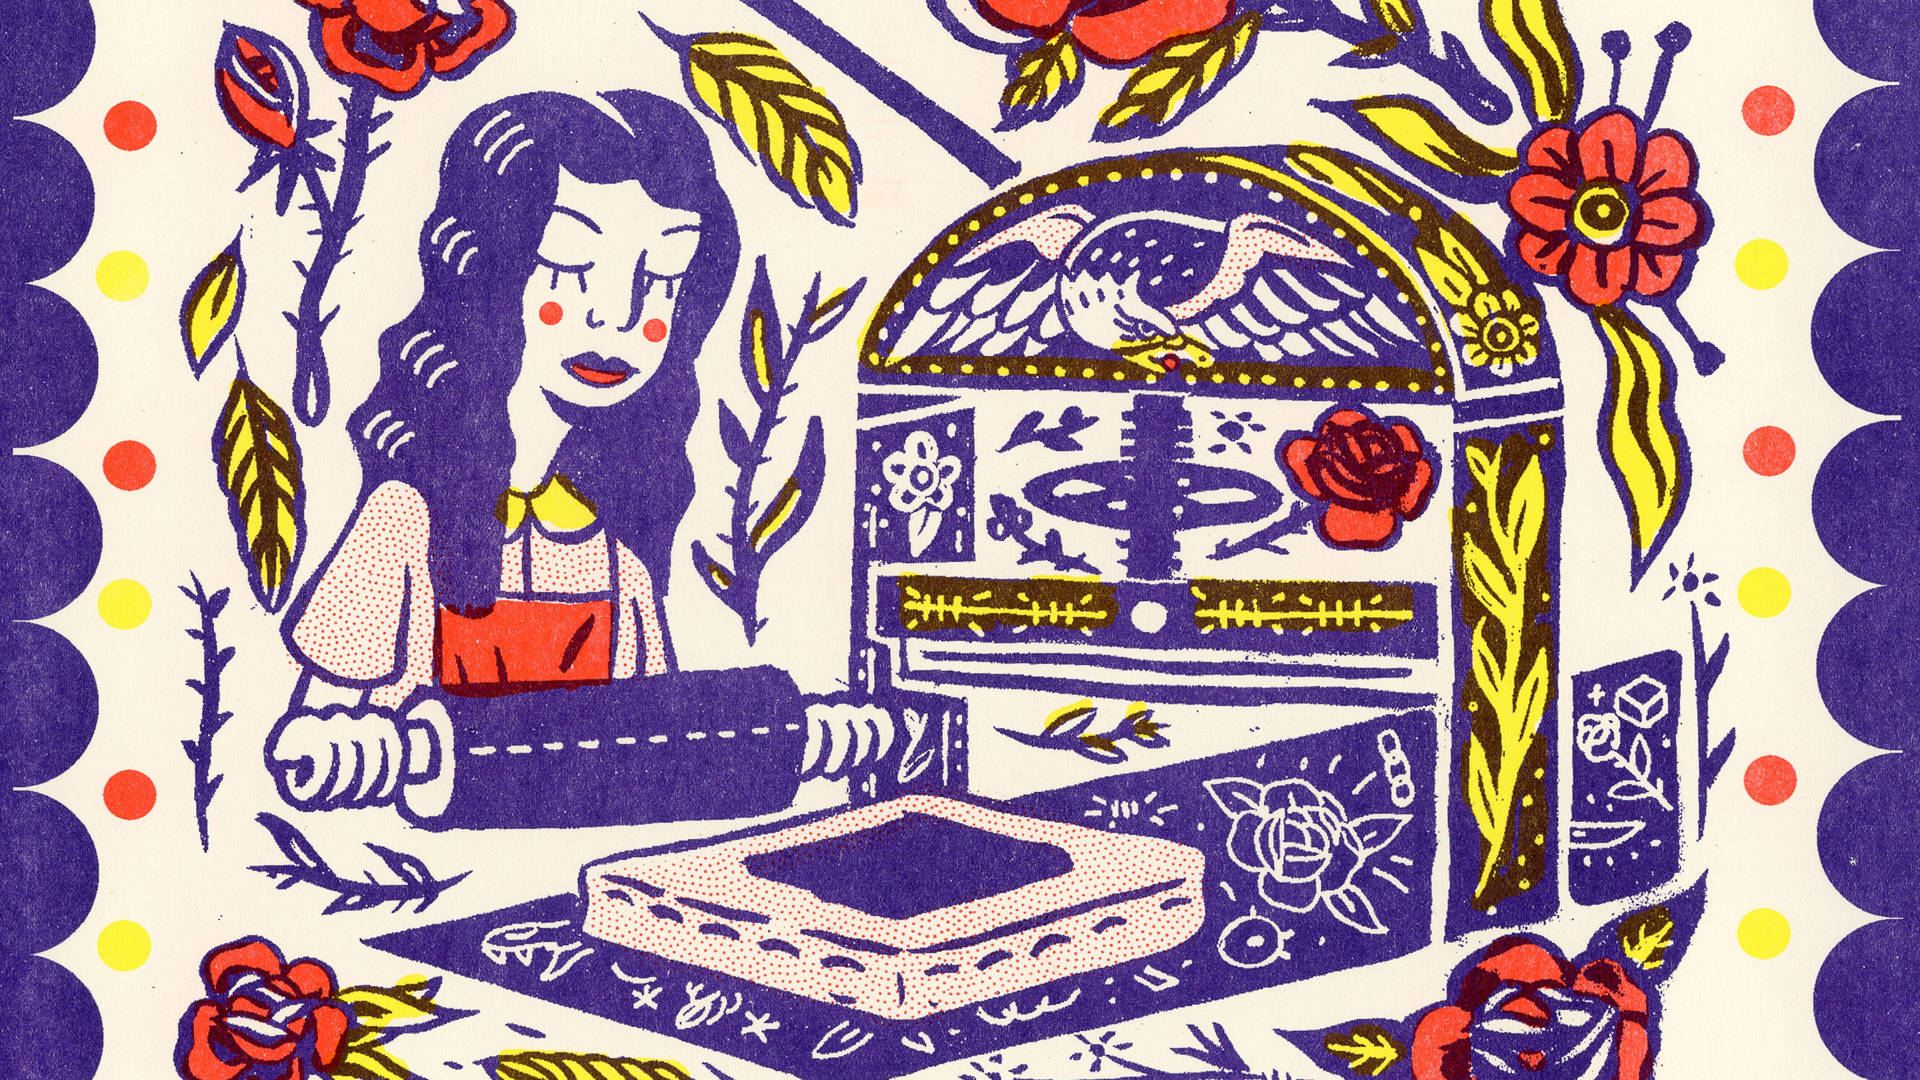 East Bay Print Sale, Dec. 10-11. Courtesy of Tiny Splendor